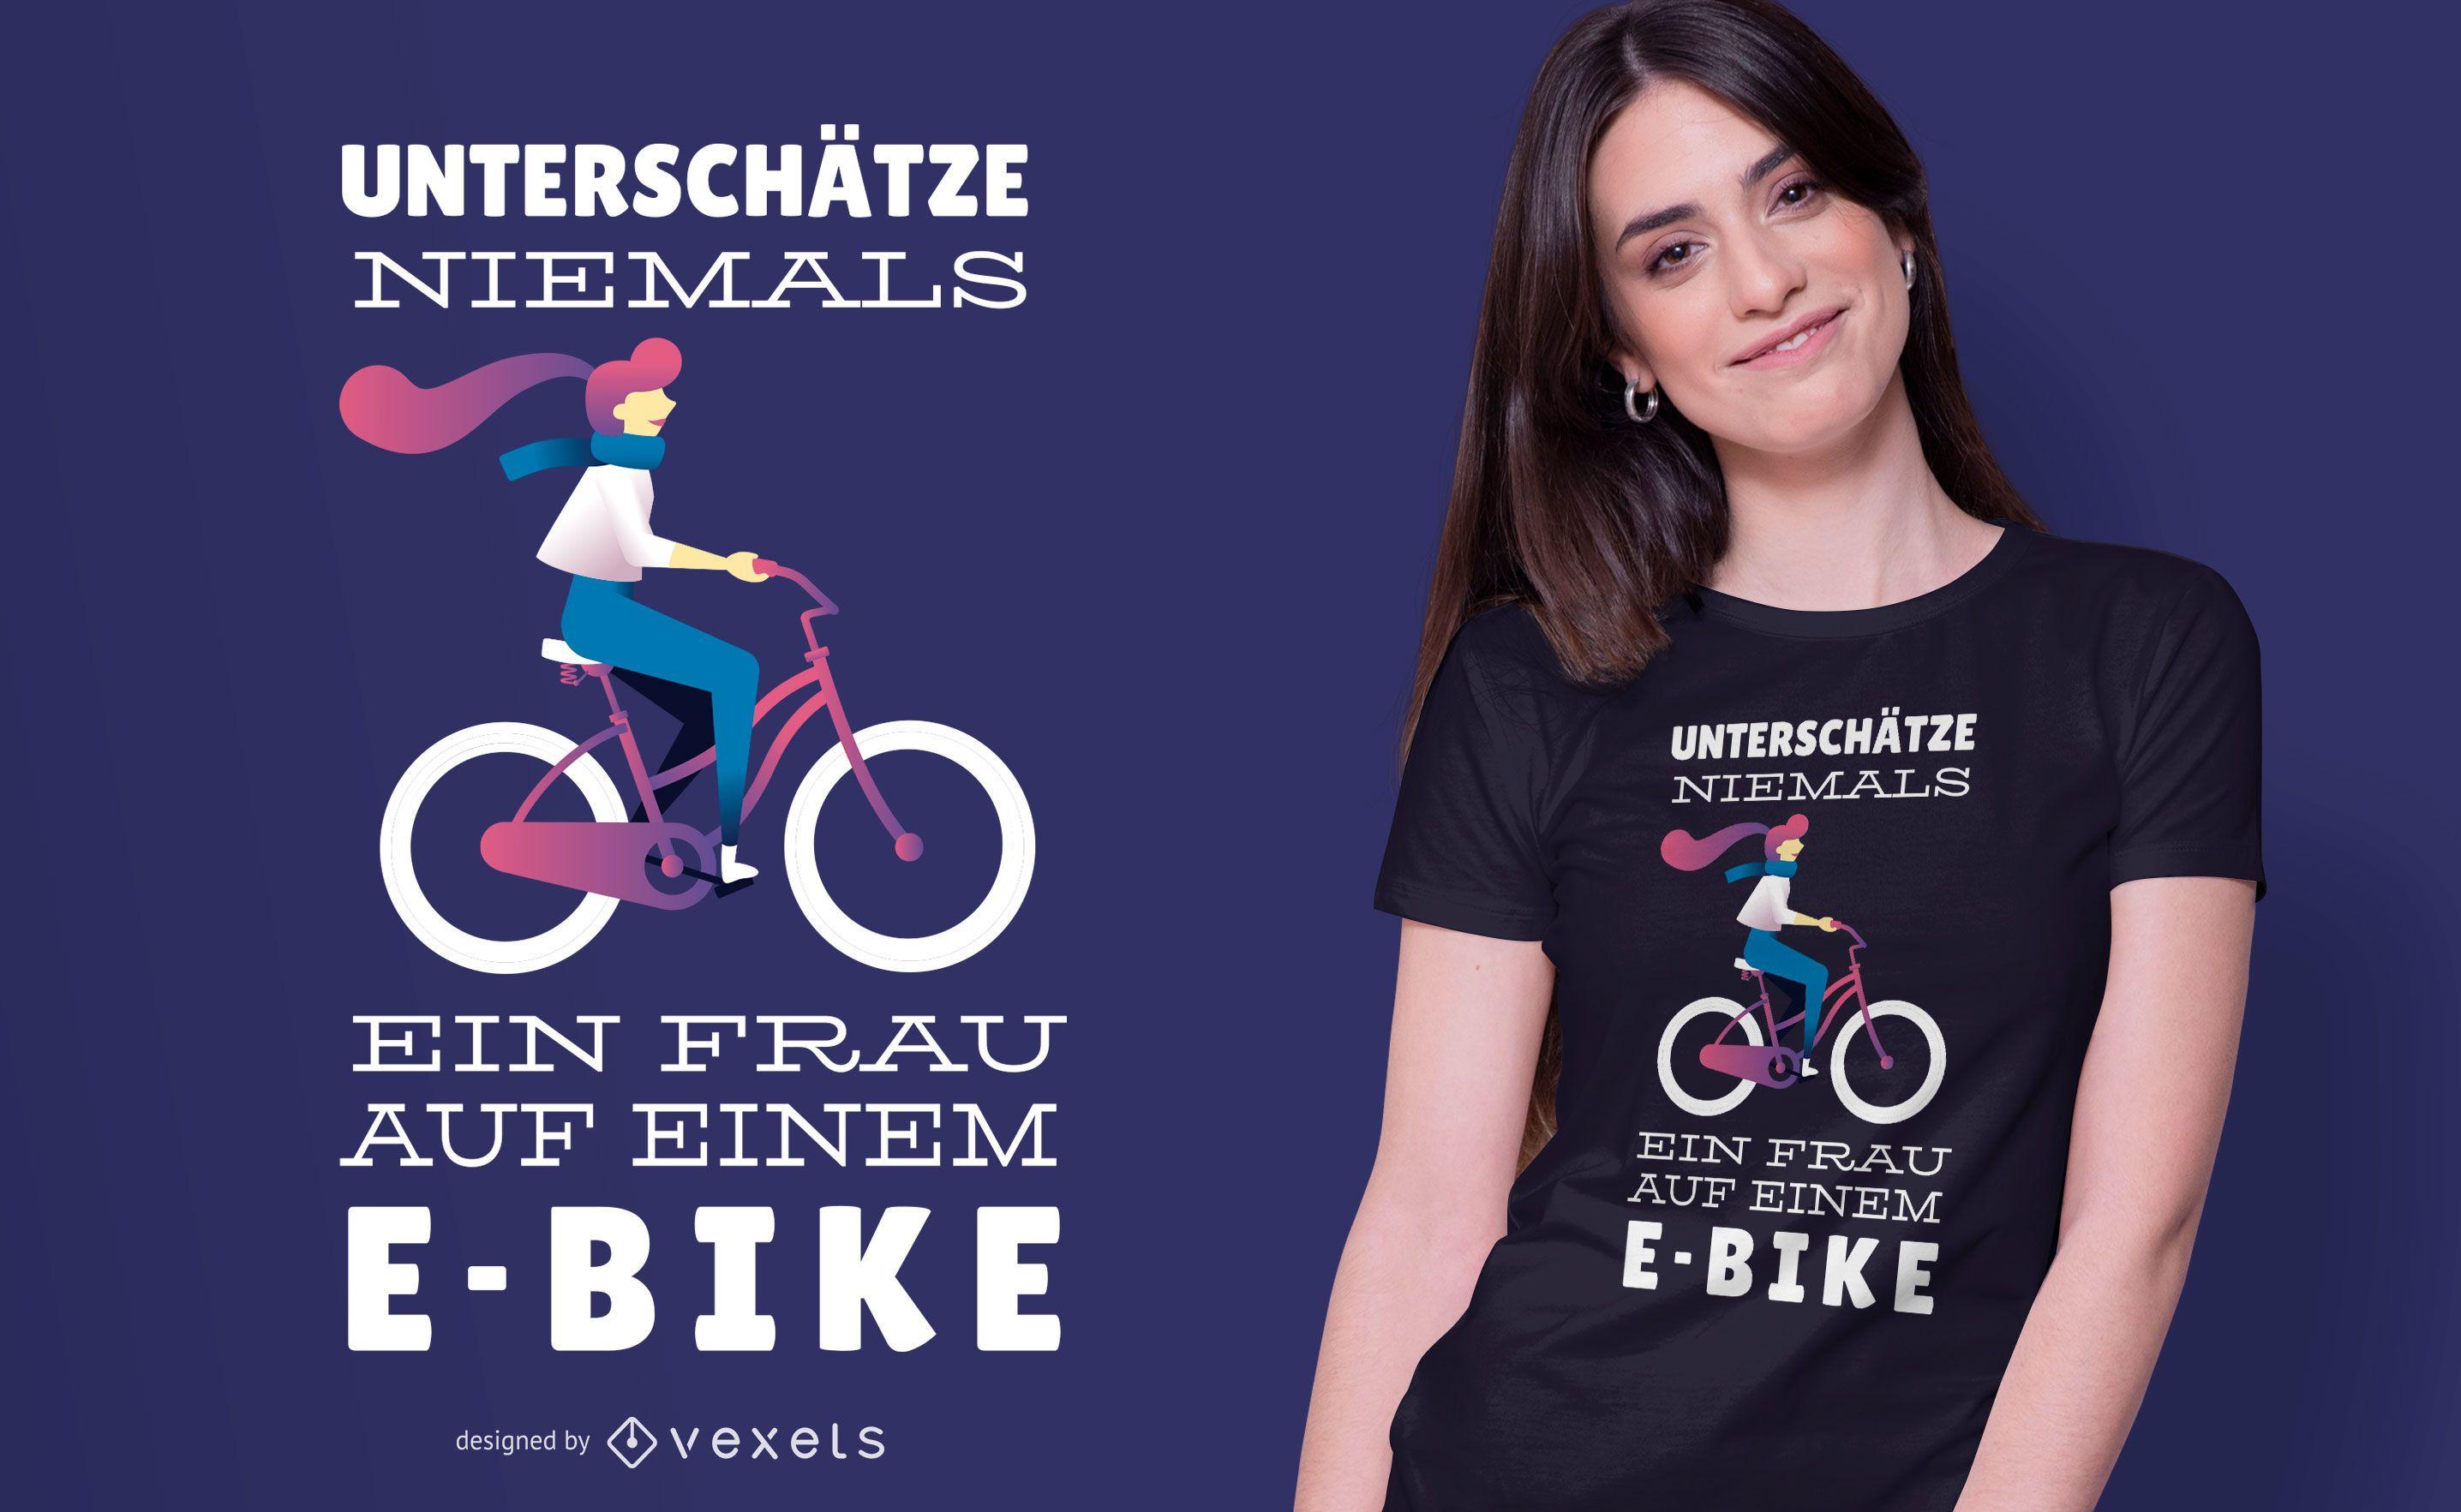 E-bike Woman German Quote T-shirt Design